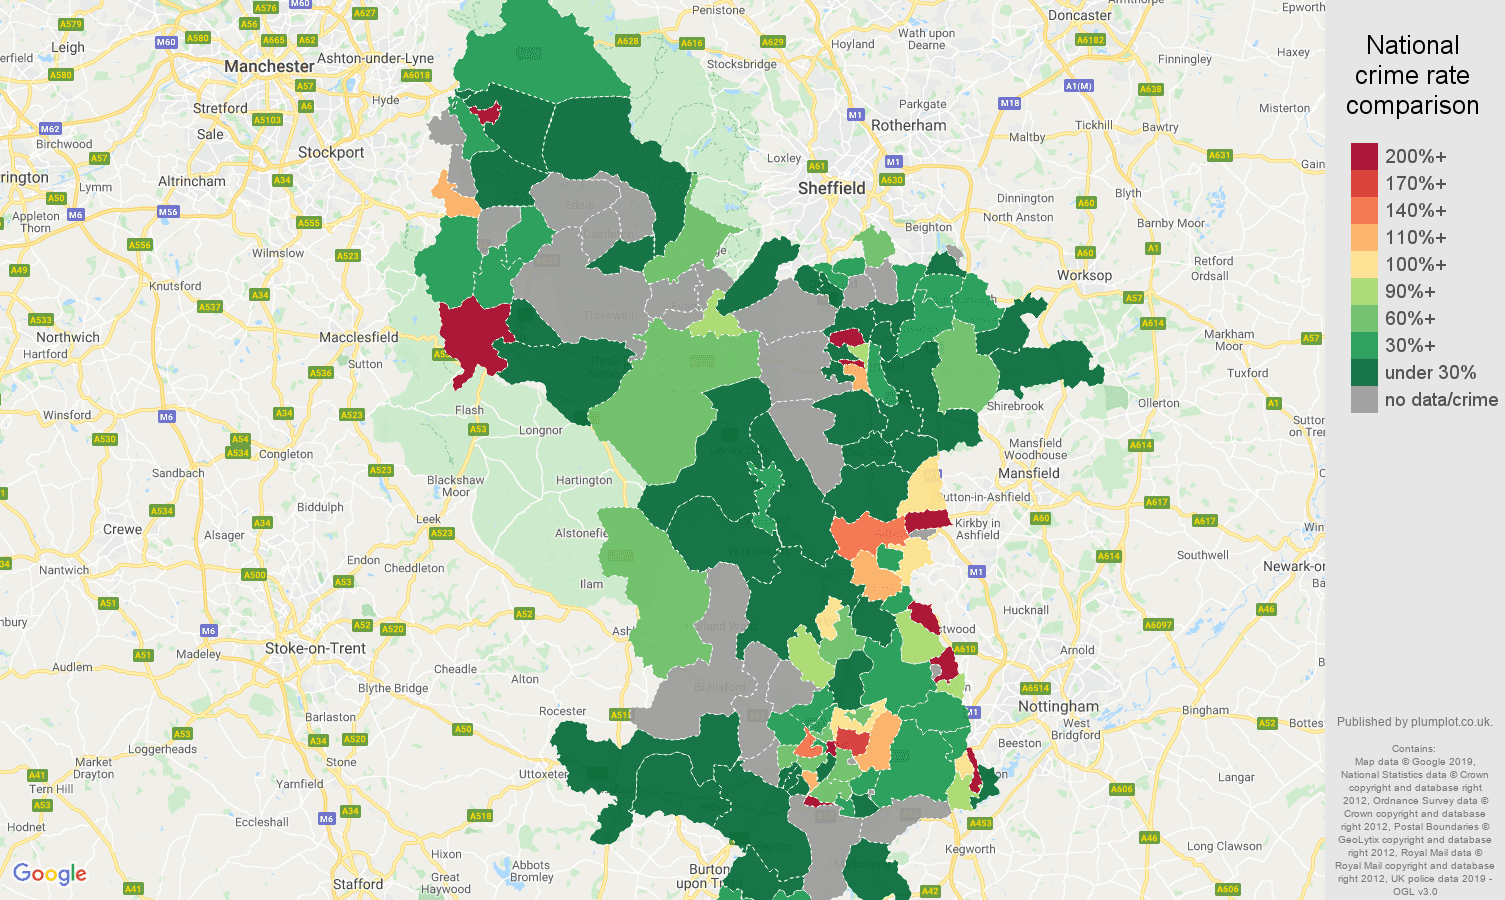 Derbyshire shoplifting crime rate comparison map